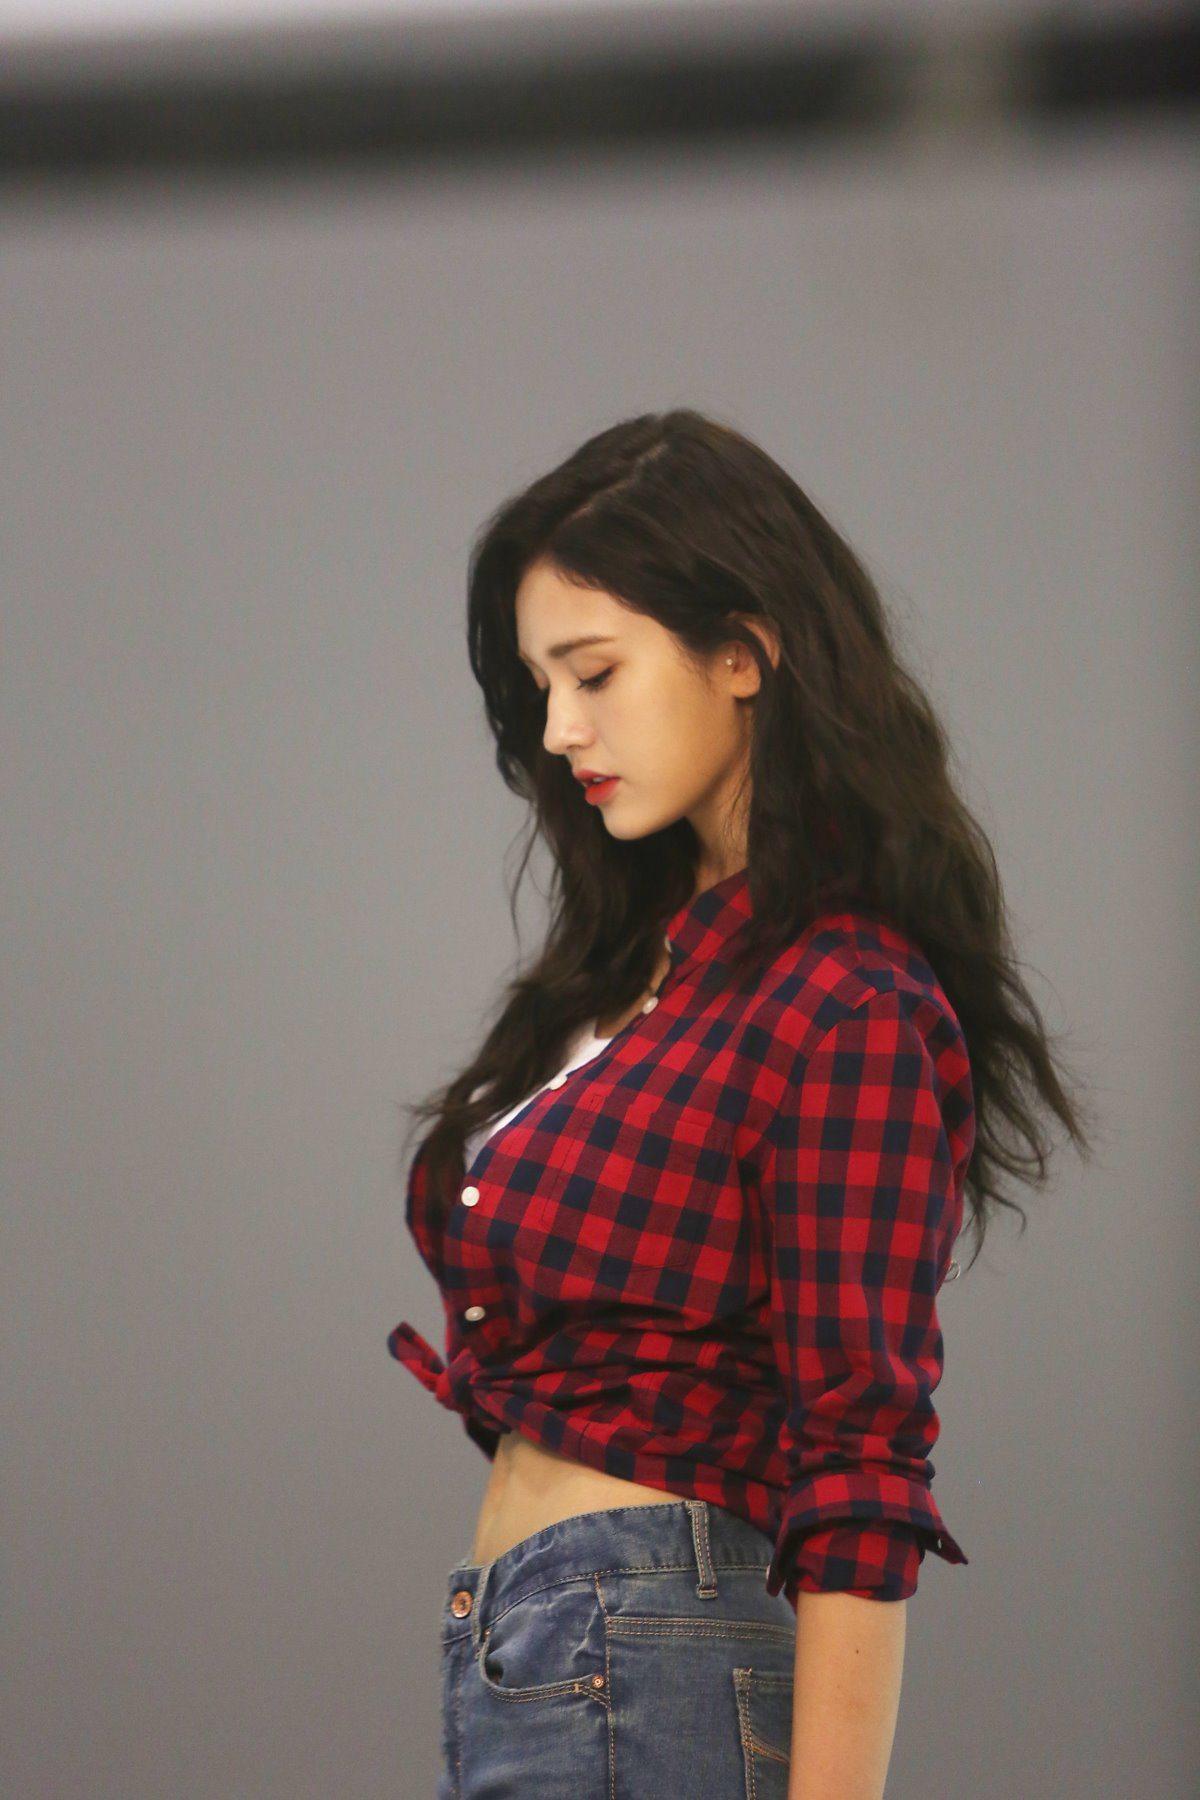 Korean video shoot - 1 7